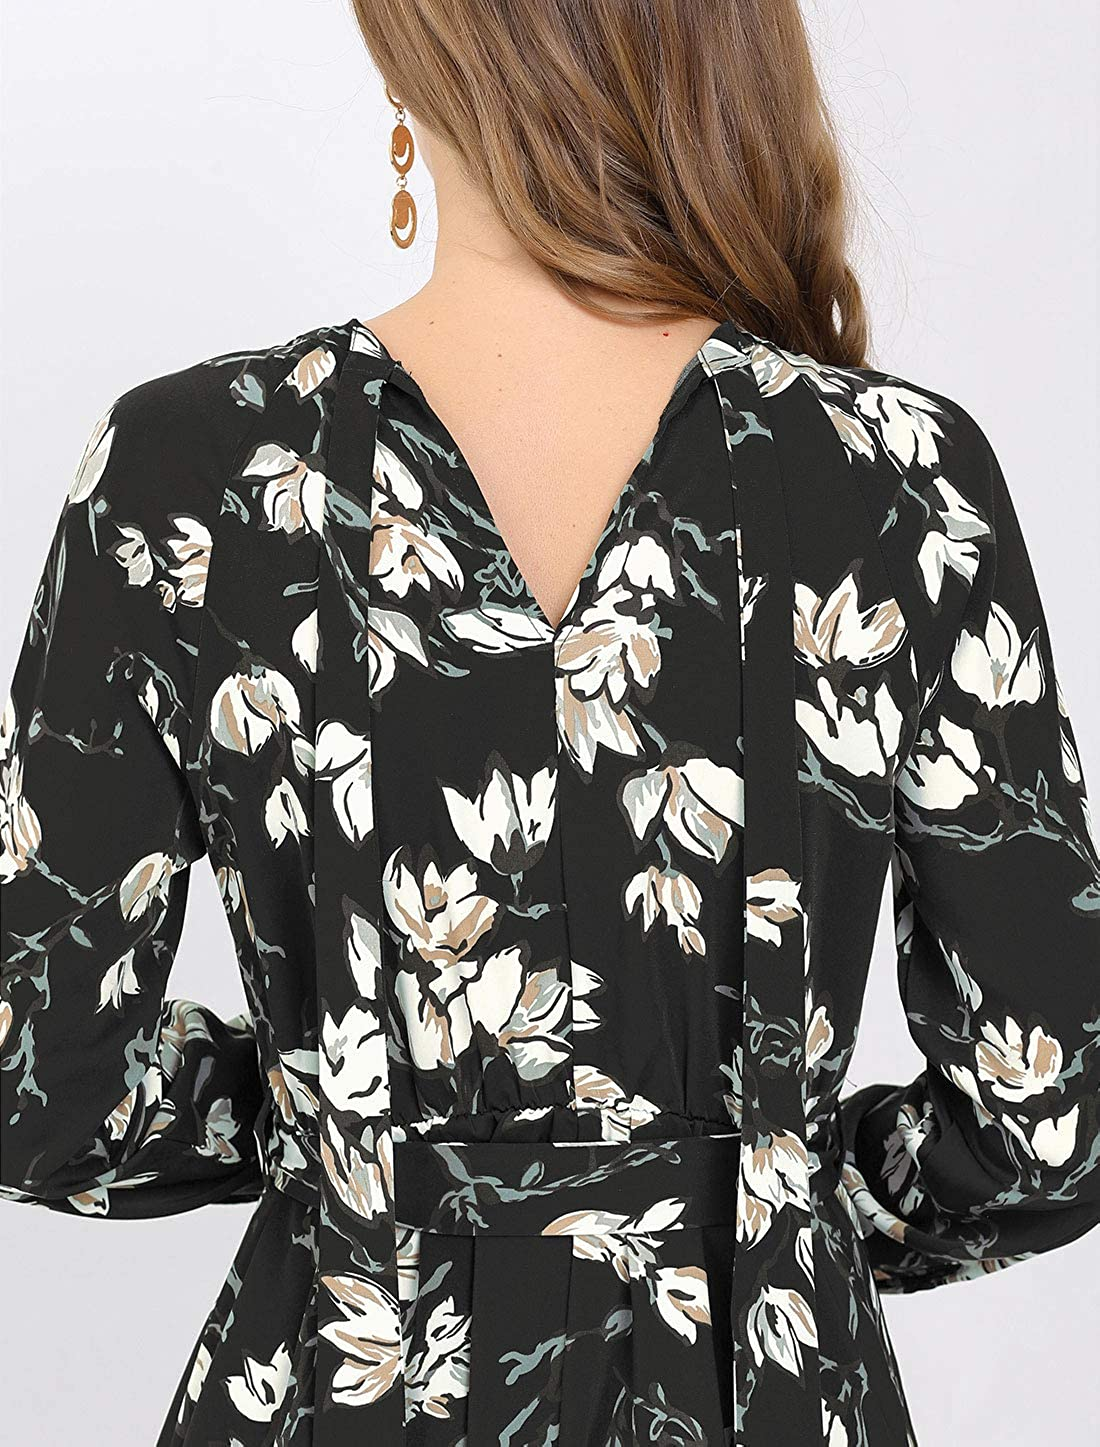 Allegra K Women's Vintage Chiffon Long Sleeves Keyhole Floral Print Belted Dress Black